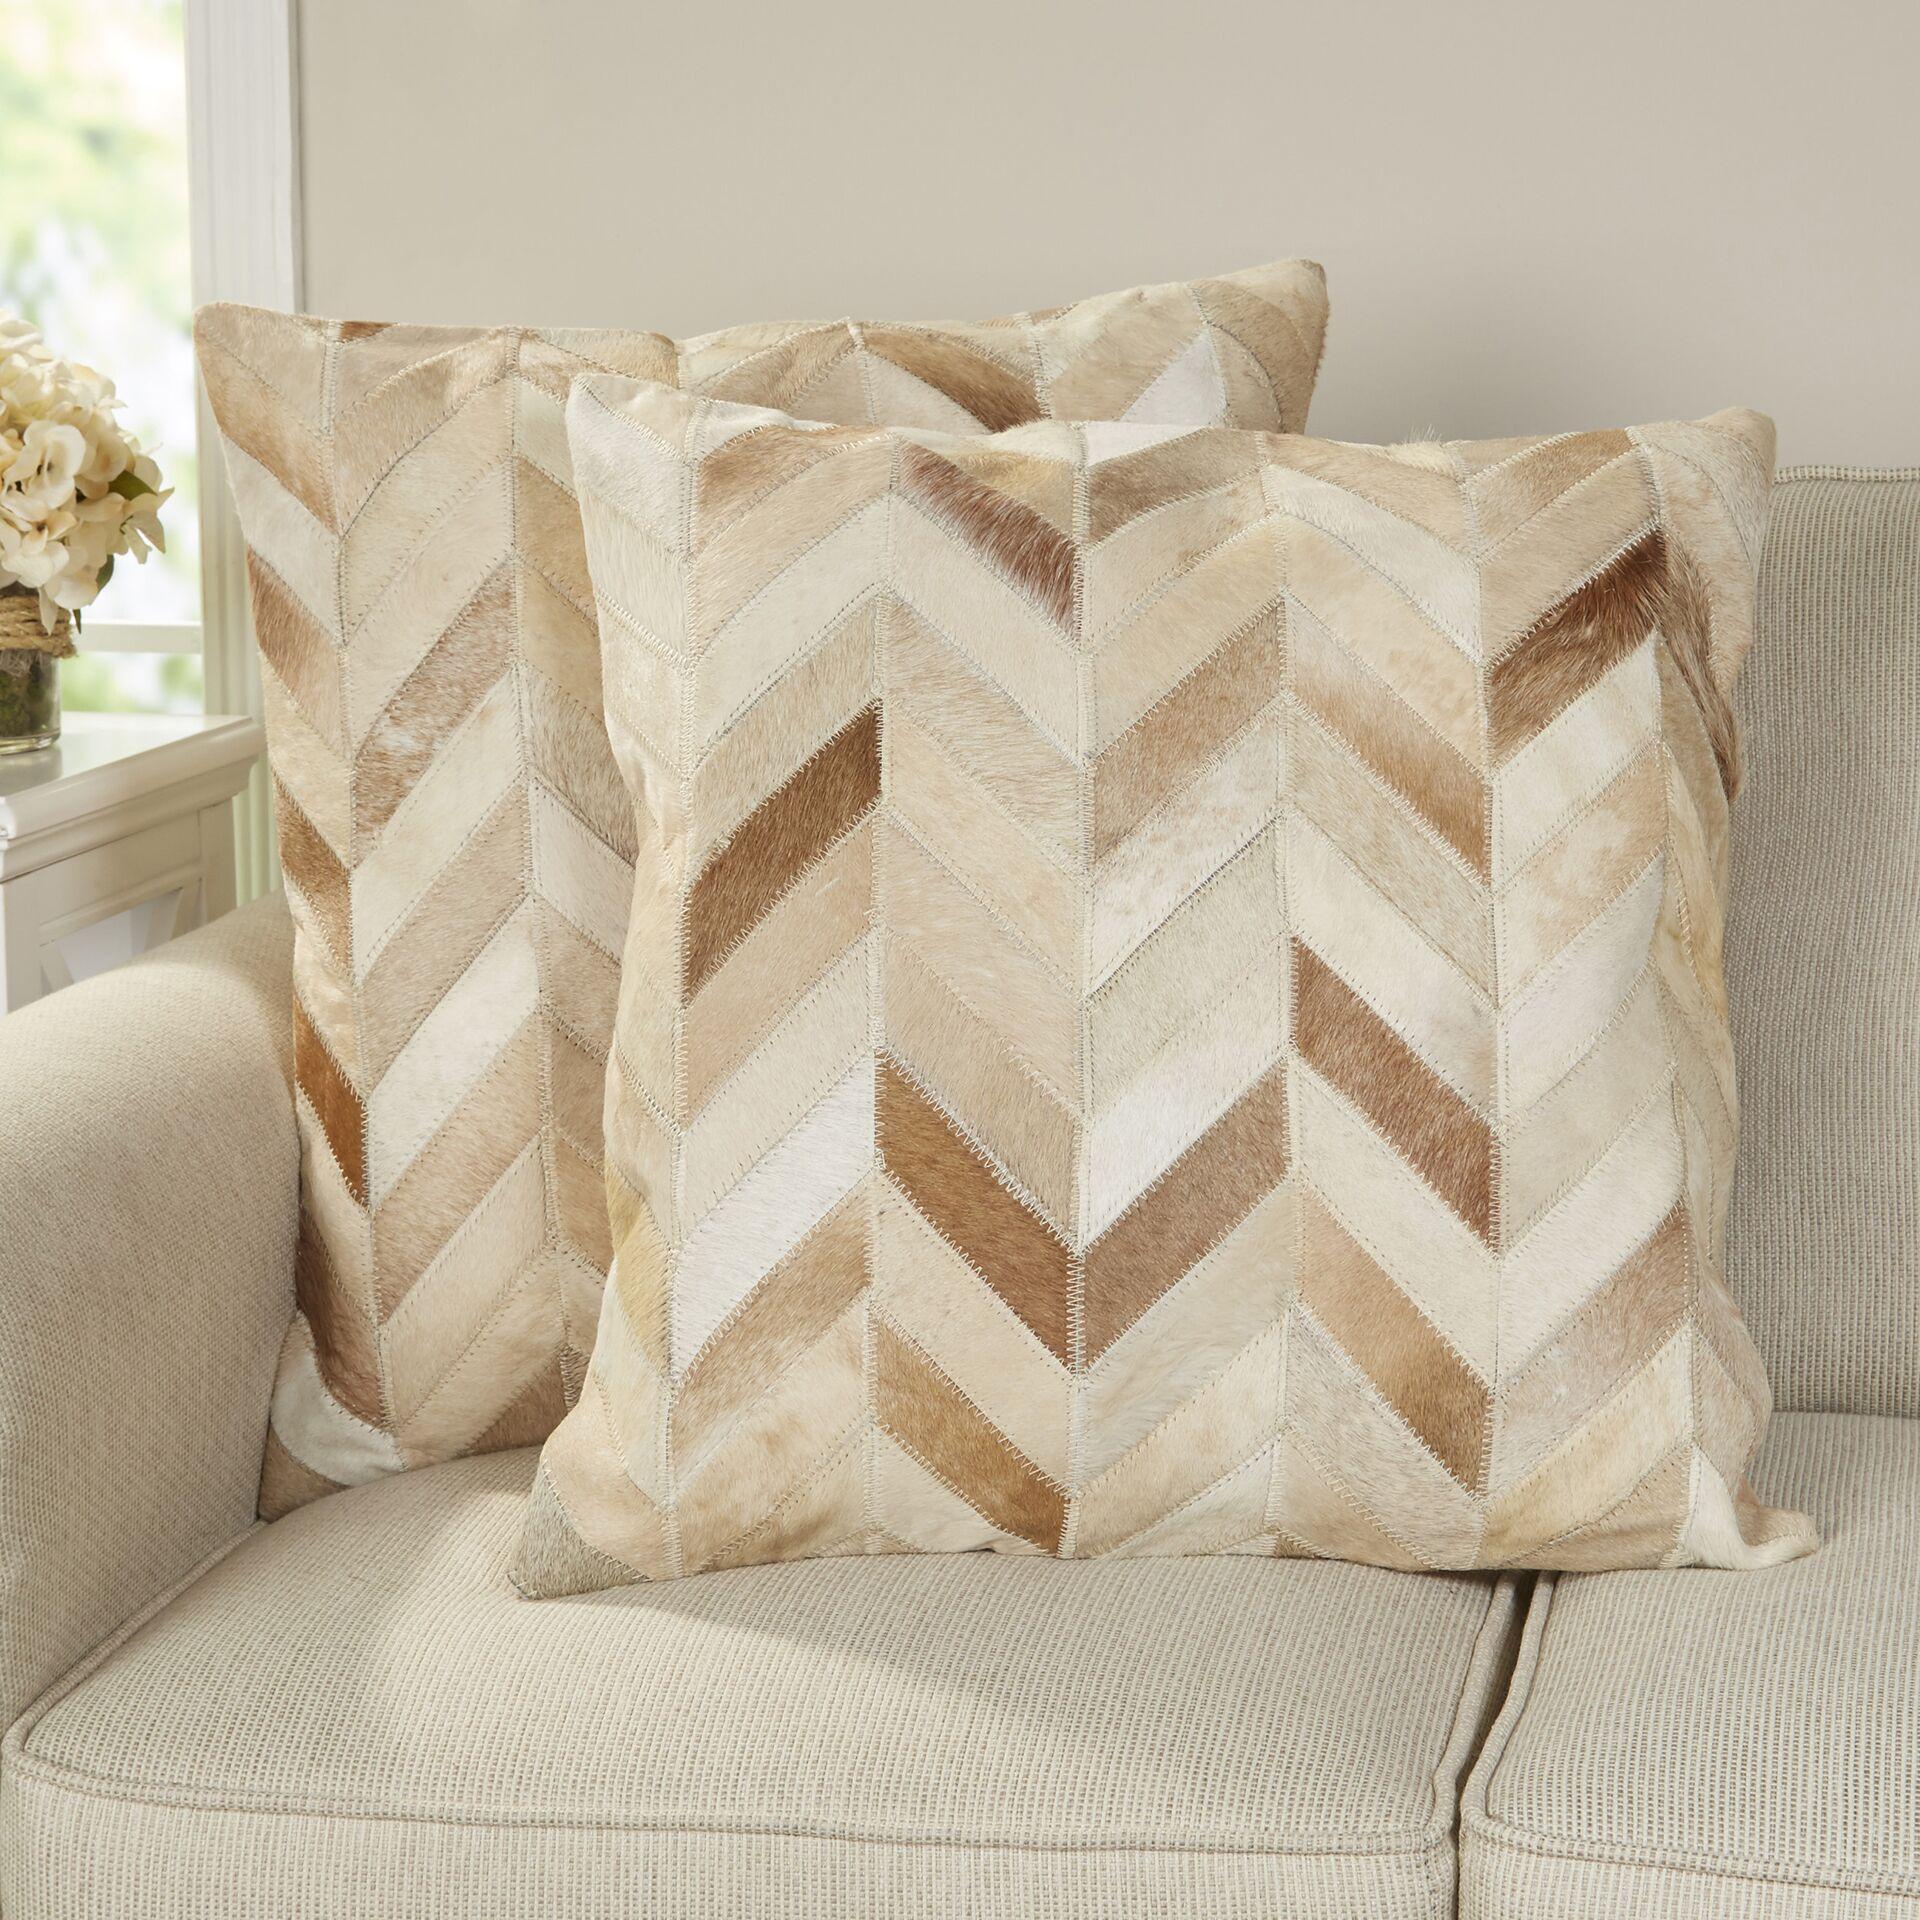 Altoona Throw Pillow Color: Multi  /  Tan, Size: 18